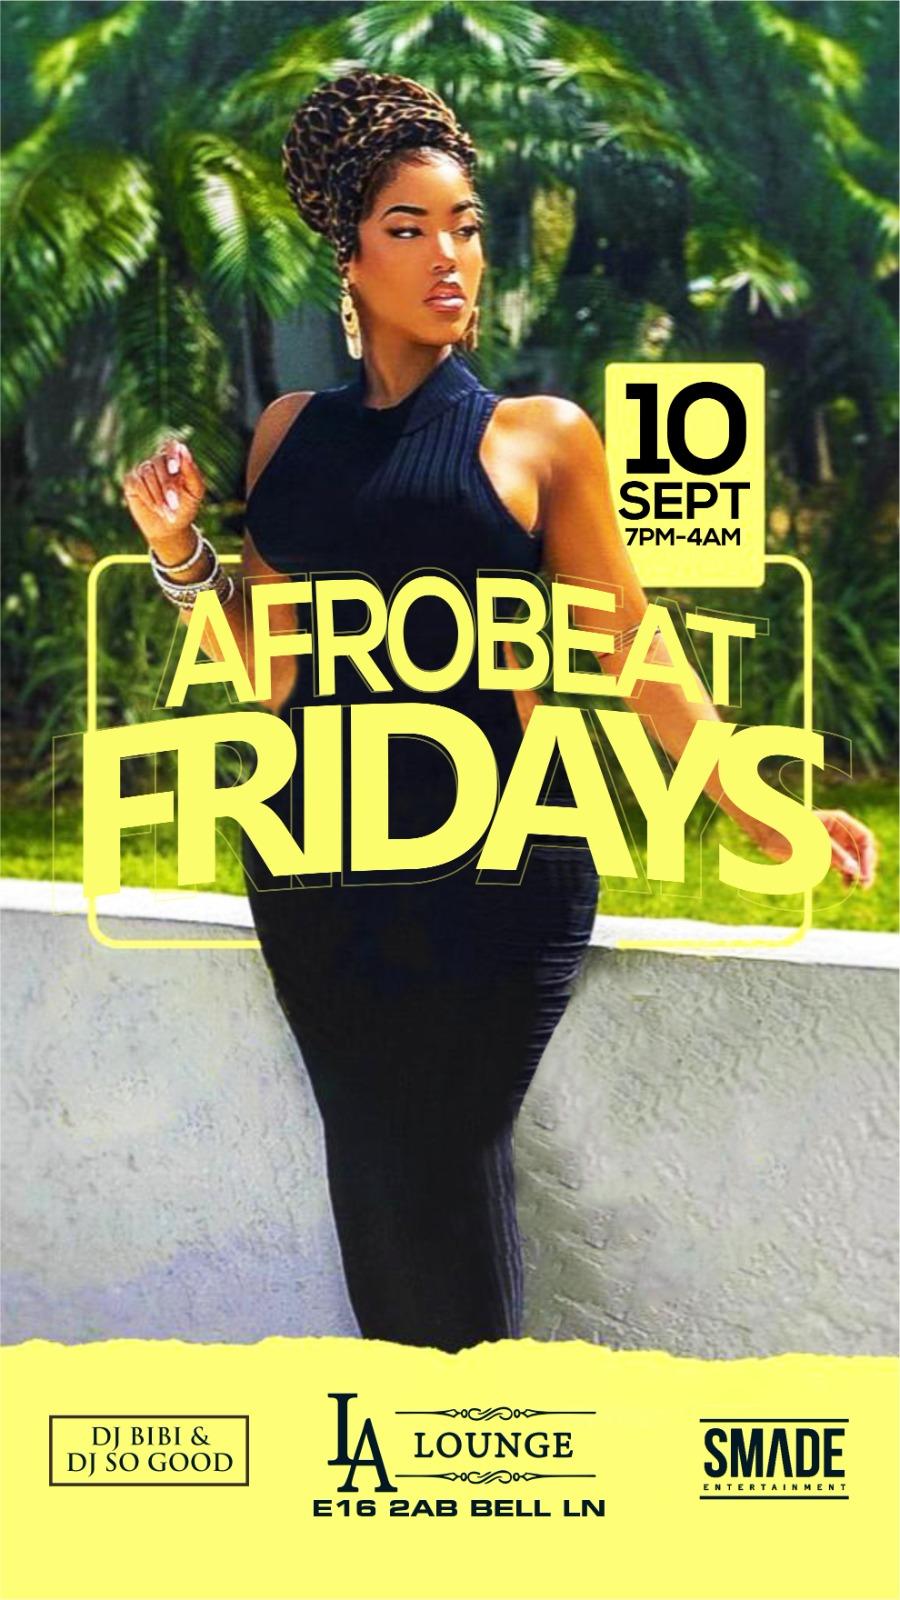 AfroBeat Fridays SEP 10